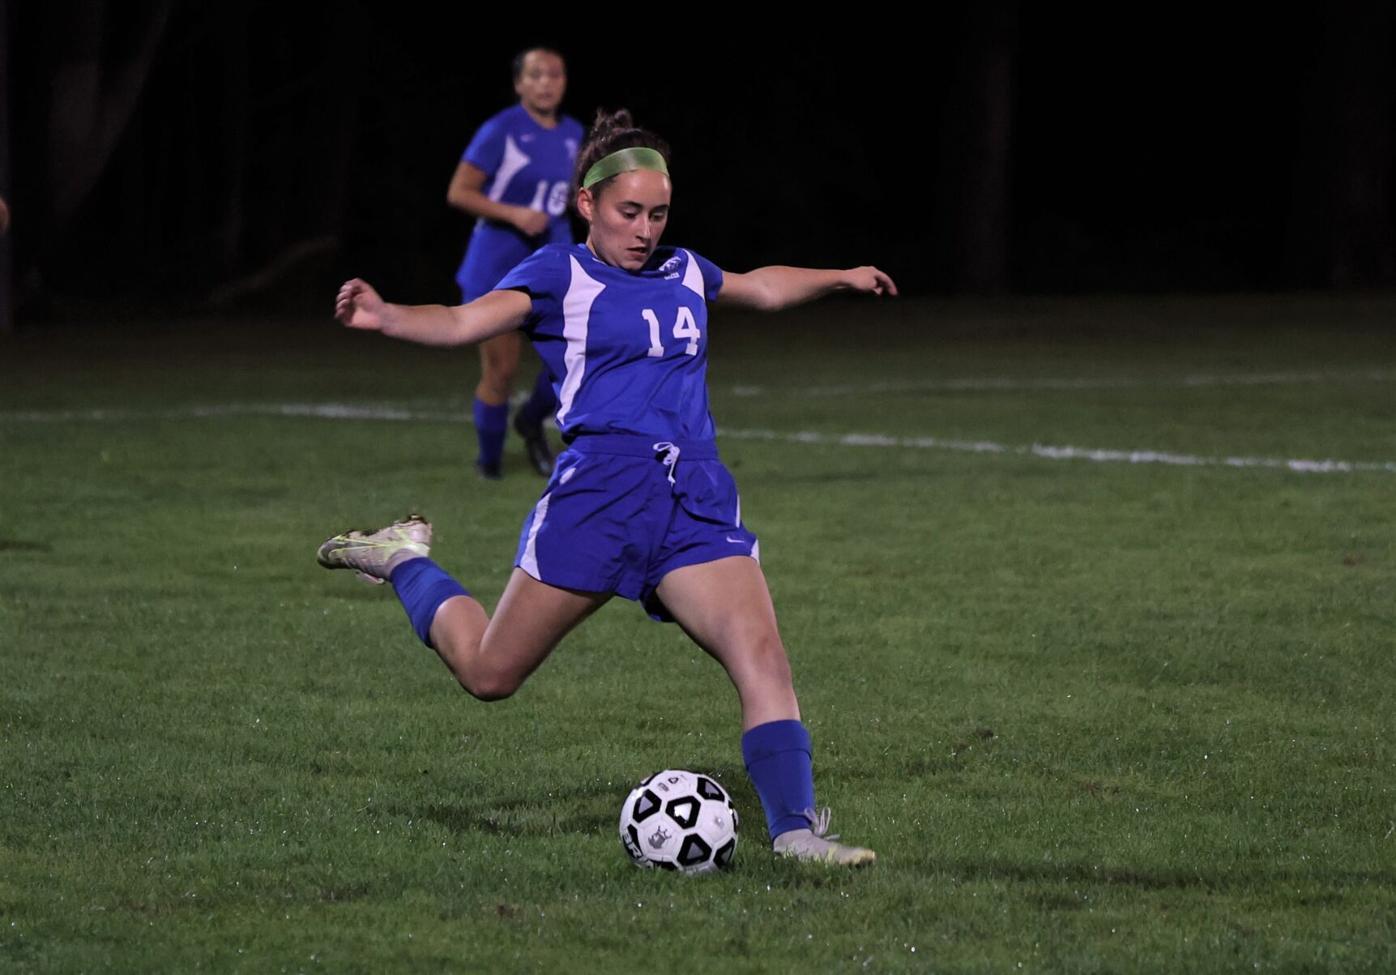 anna naef kicks the ball